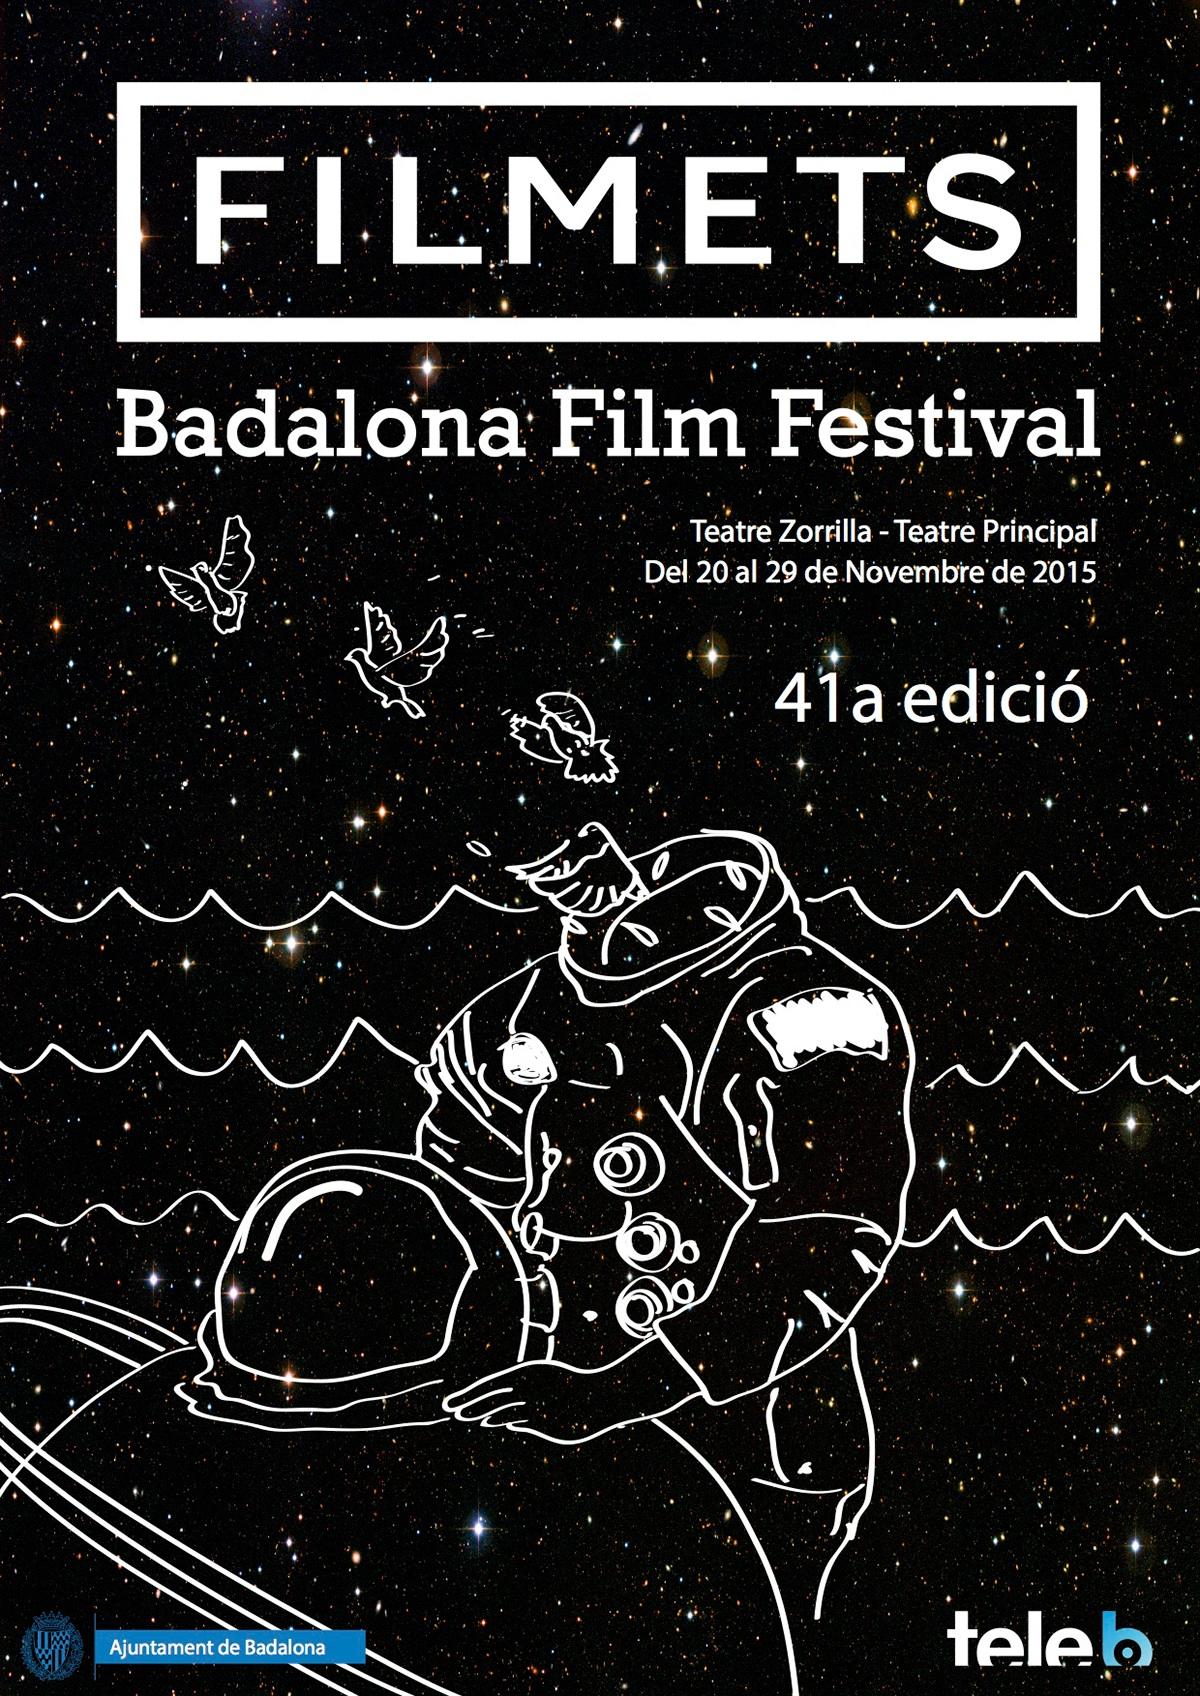 Badalona festival filmets cartel cartell cine